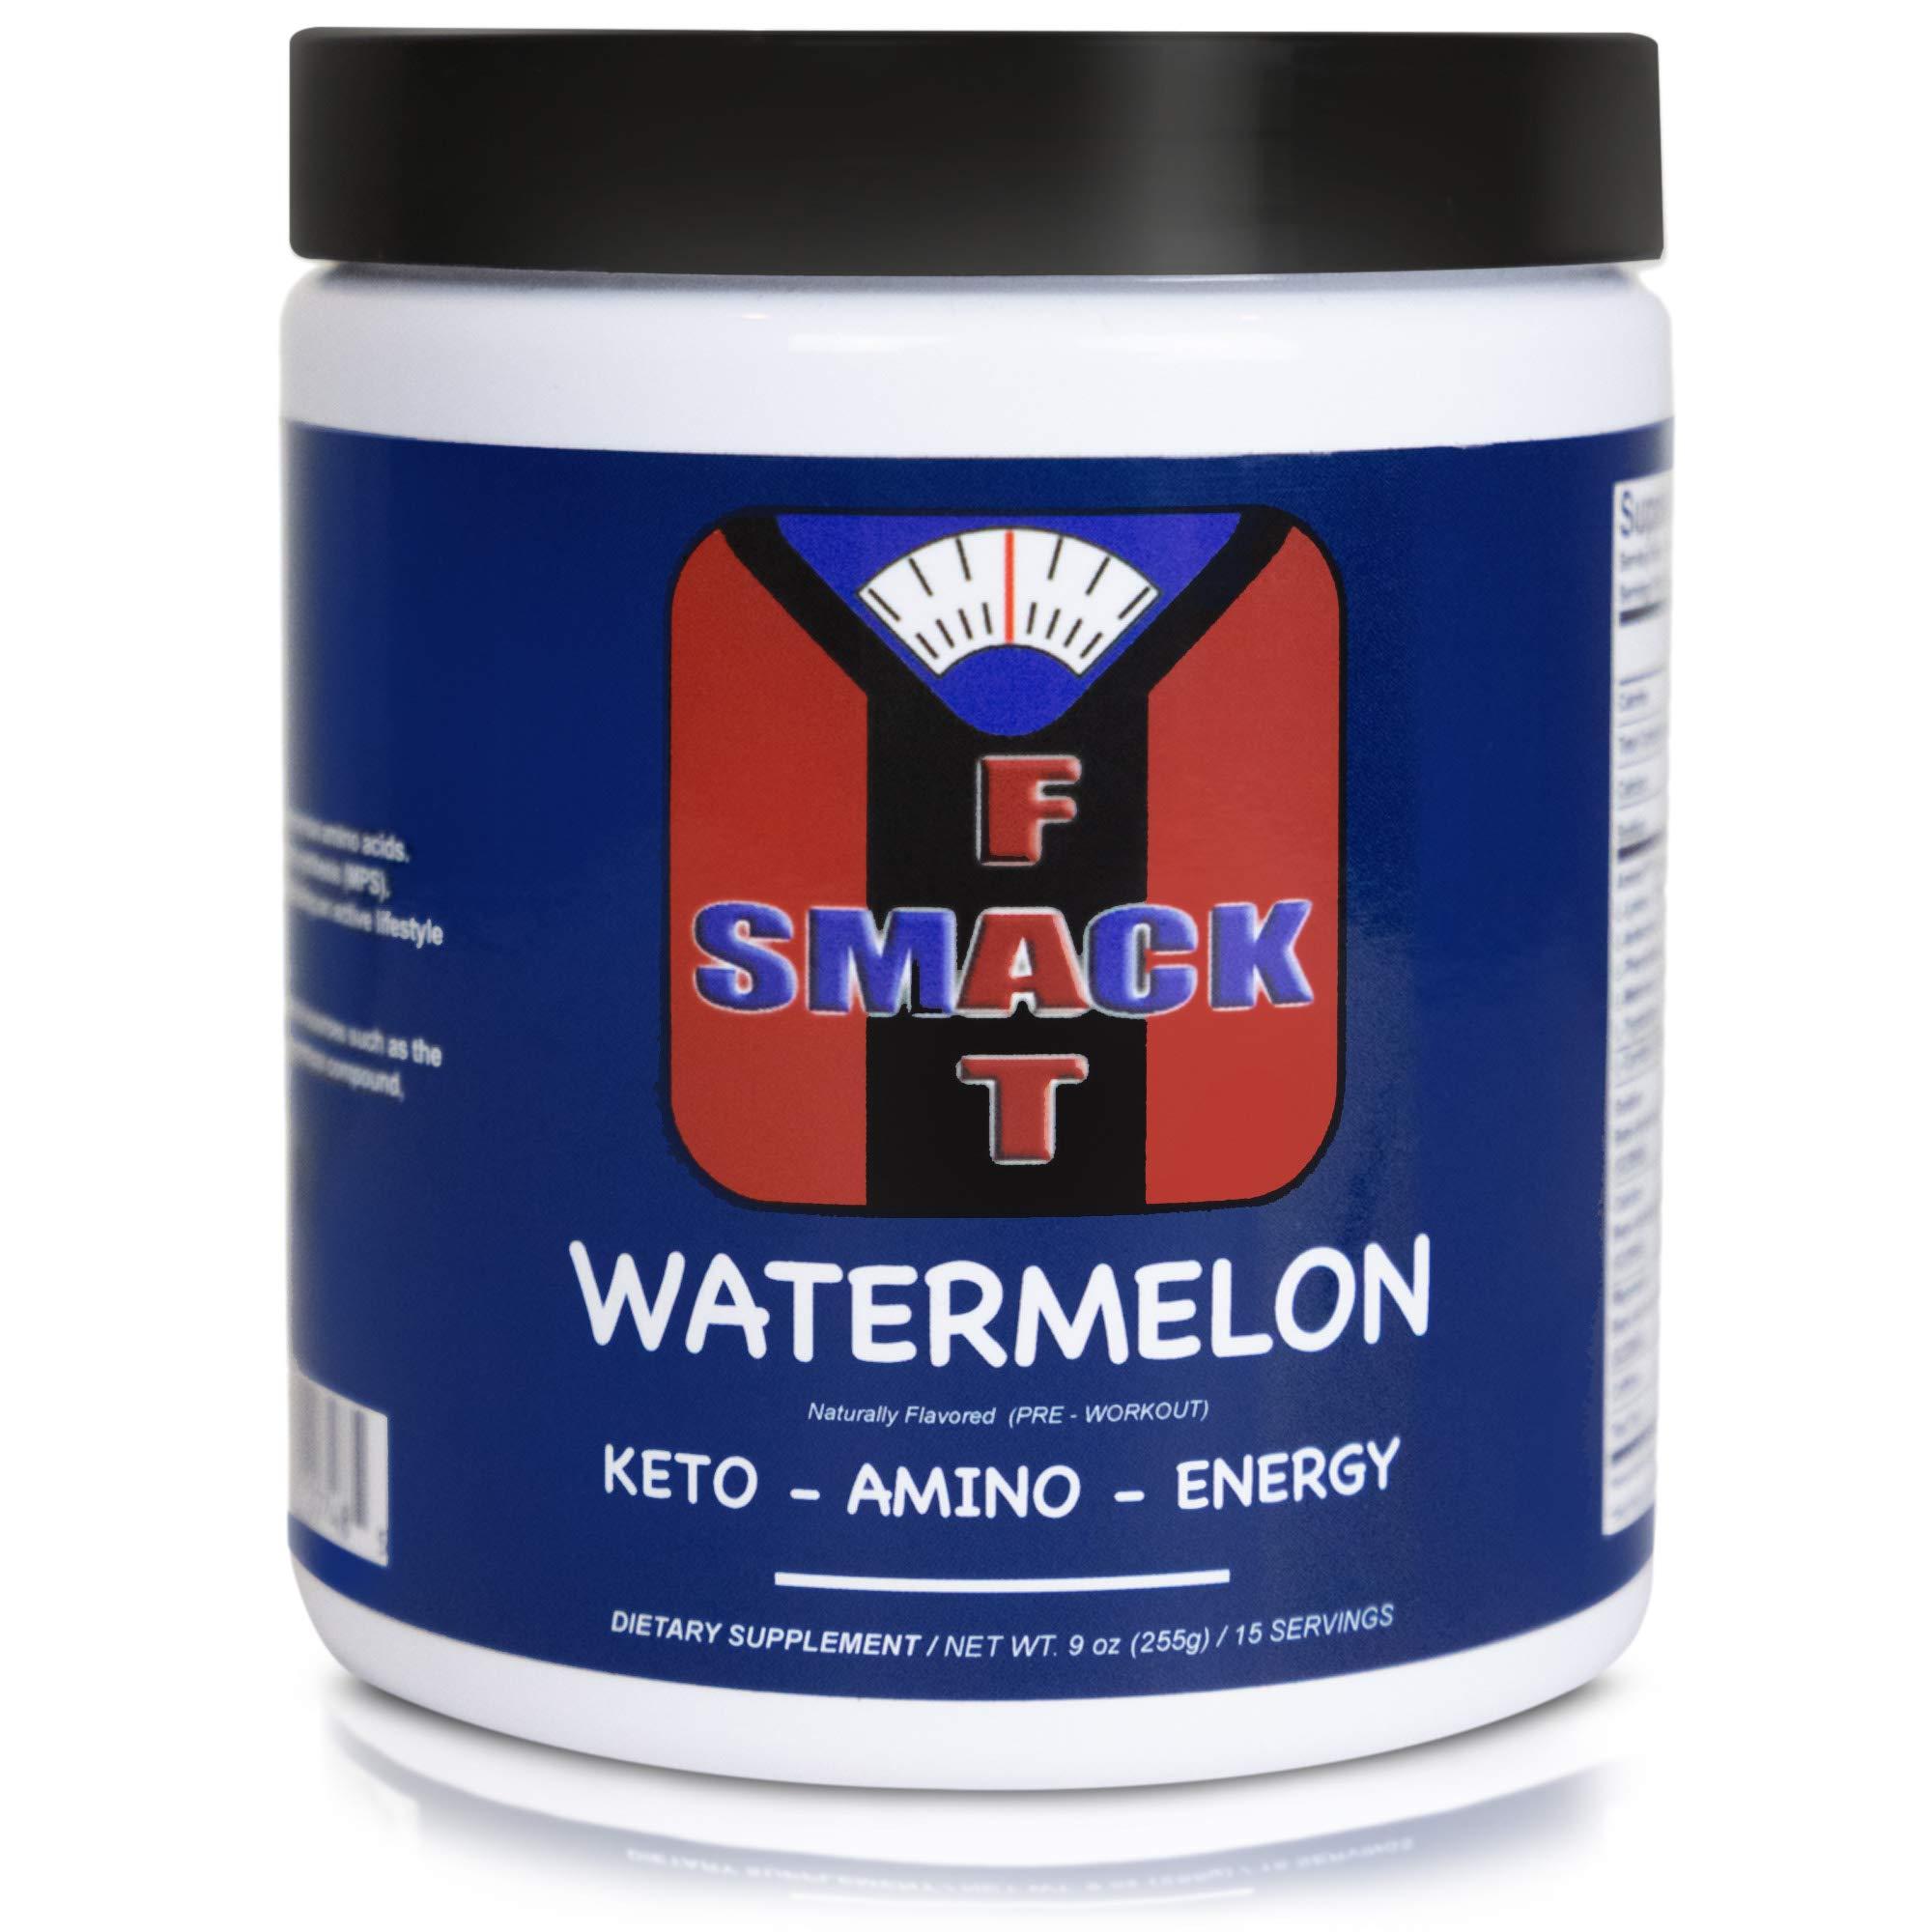 Smackfat Keto Amino Energy - Keto Pre Workout Powder - BHB Exogenous Ketones + BCAAS Amino Acids (Amino9) + TeaCrine - Keto Powder for Weight Loss (Watermelon)